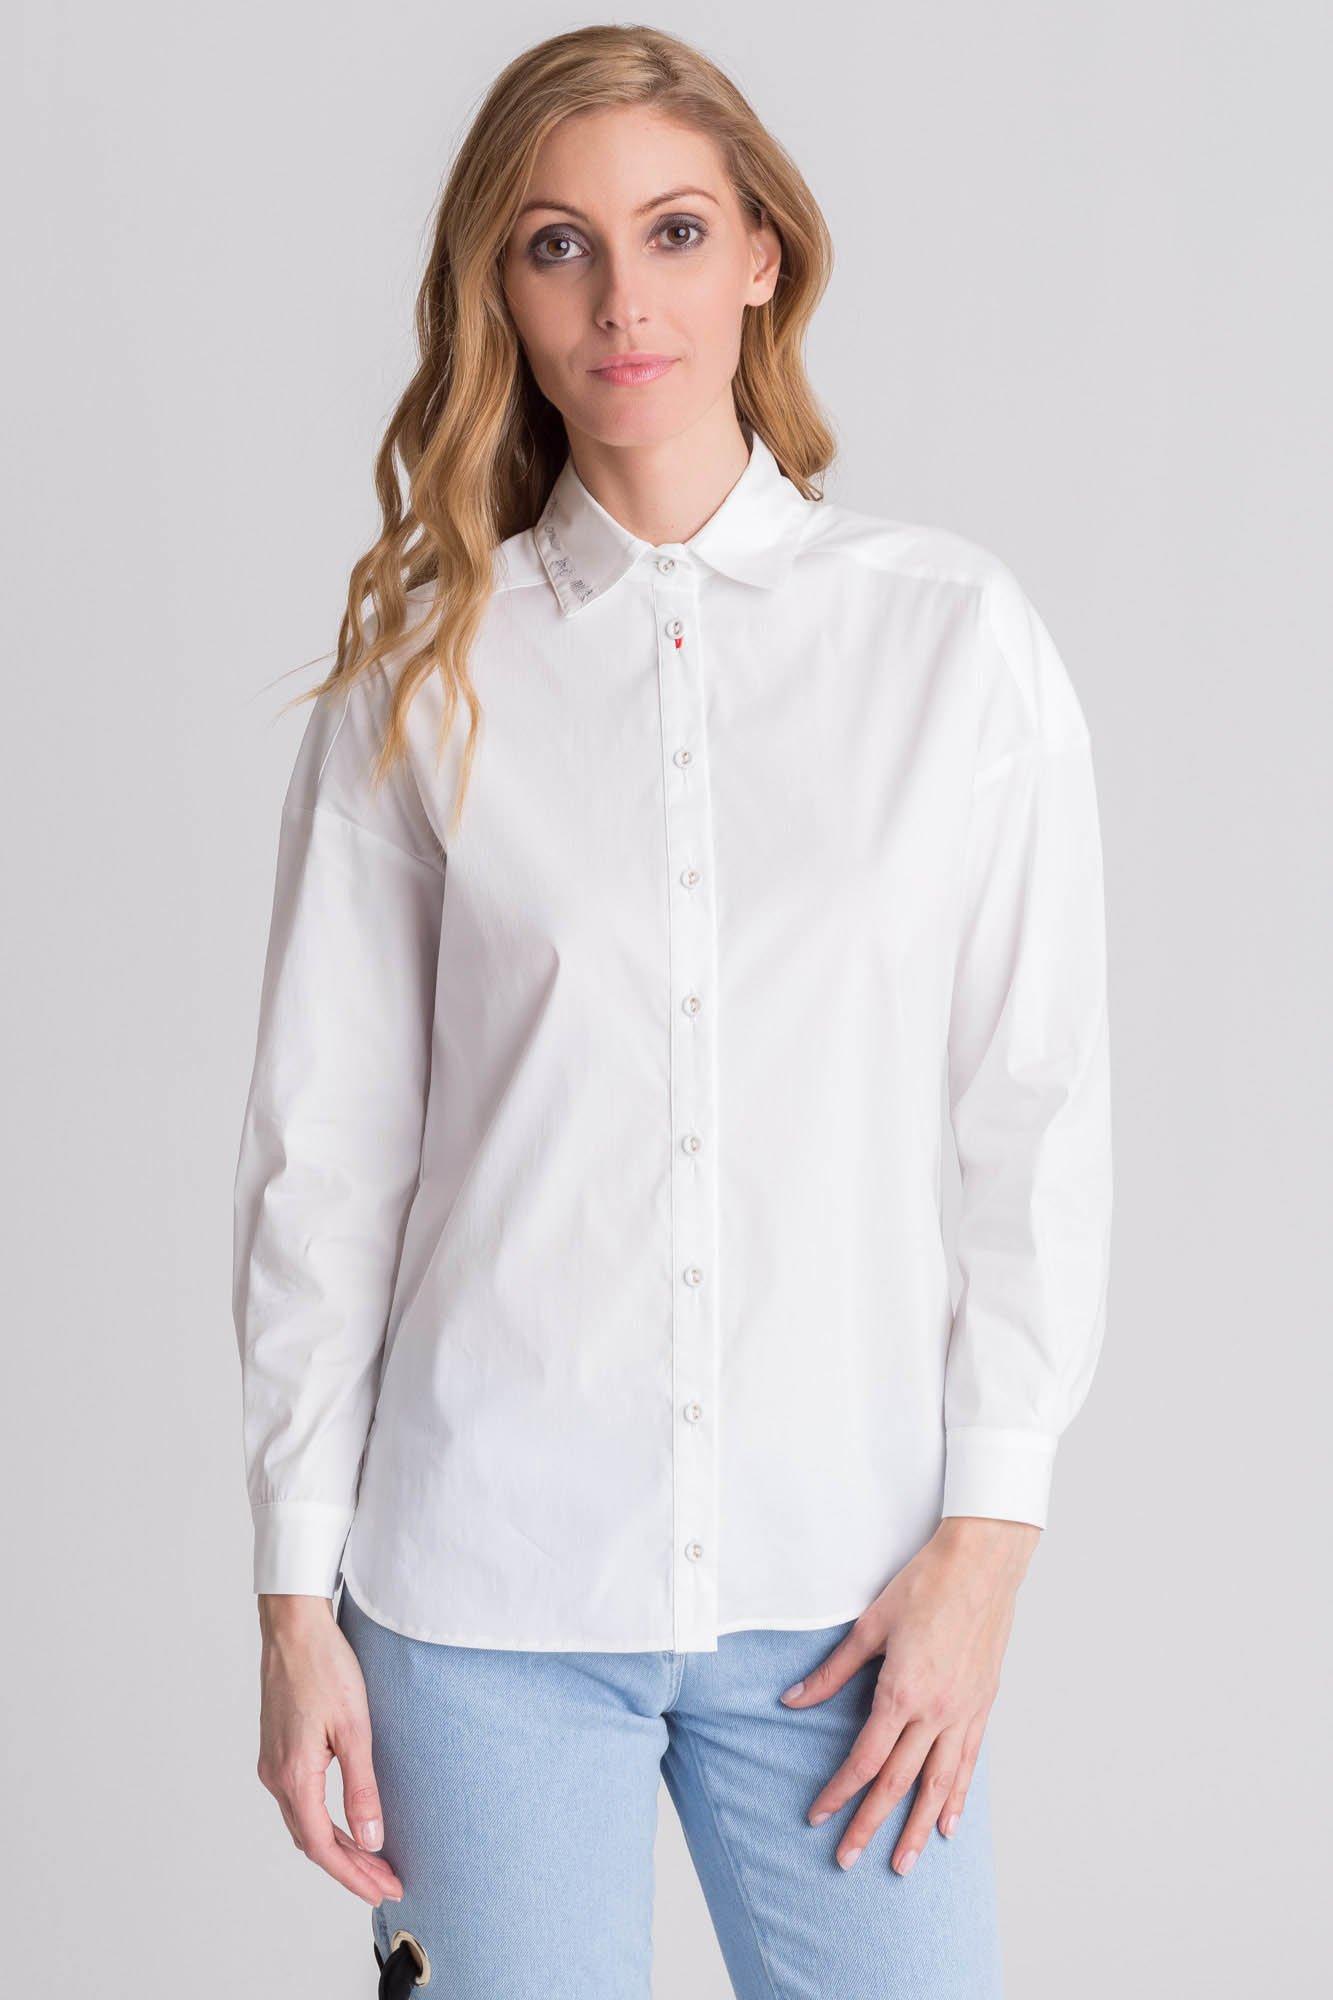 9a1d8b3d5ef4 ... Biała koszula damska z haftem ...